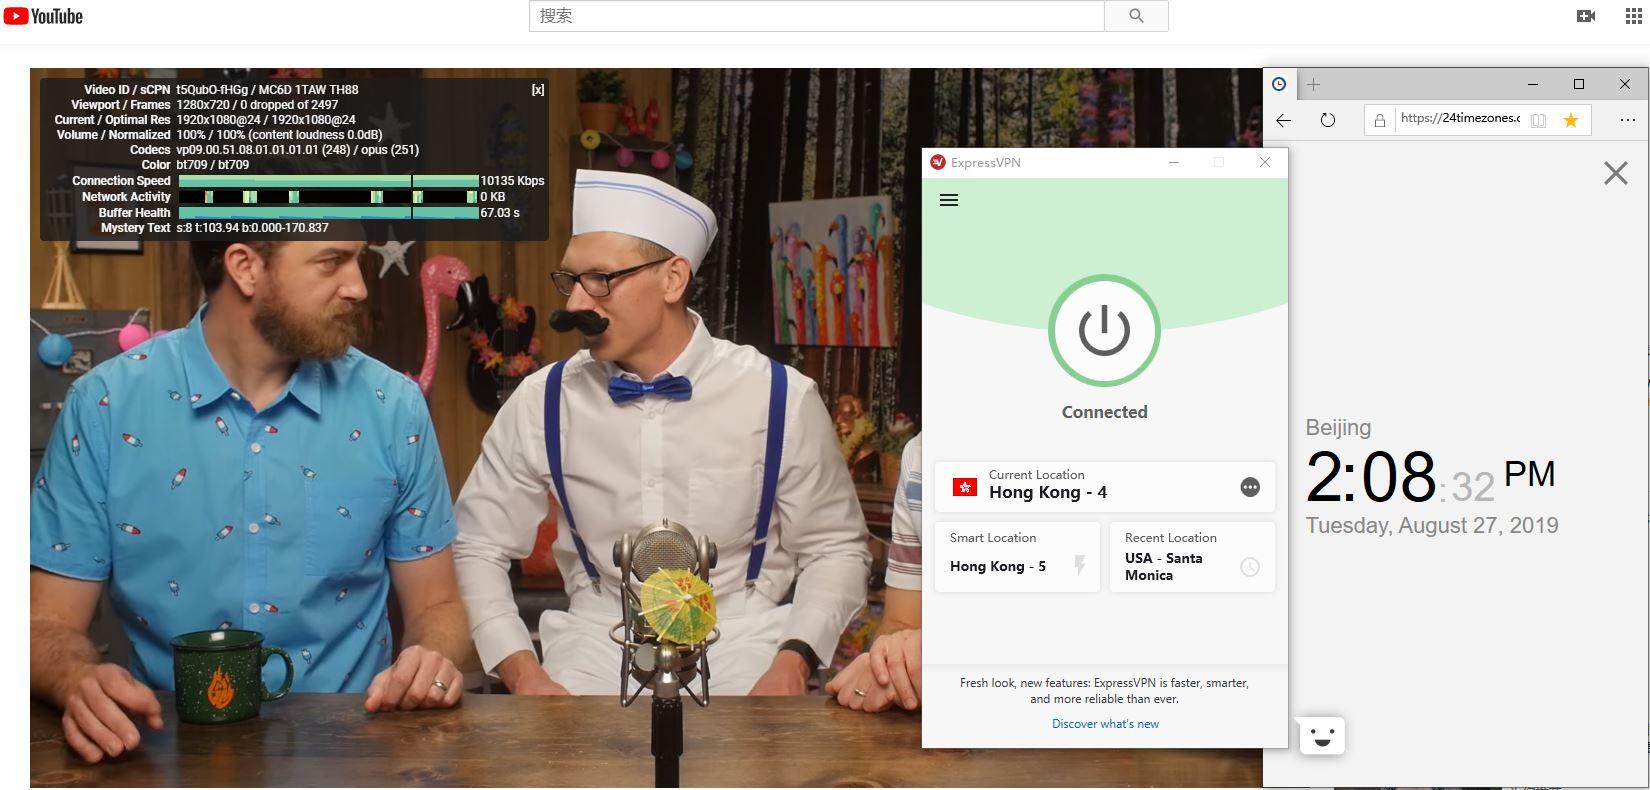 windows expressvpn 香港-4服务器 中国VPN翻墙 科学上网 YouTube速度测试-20190827